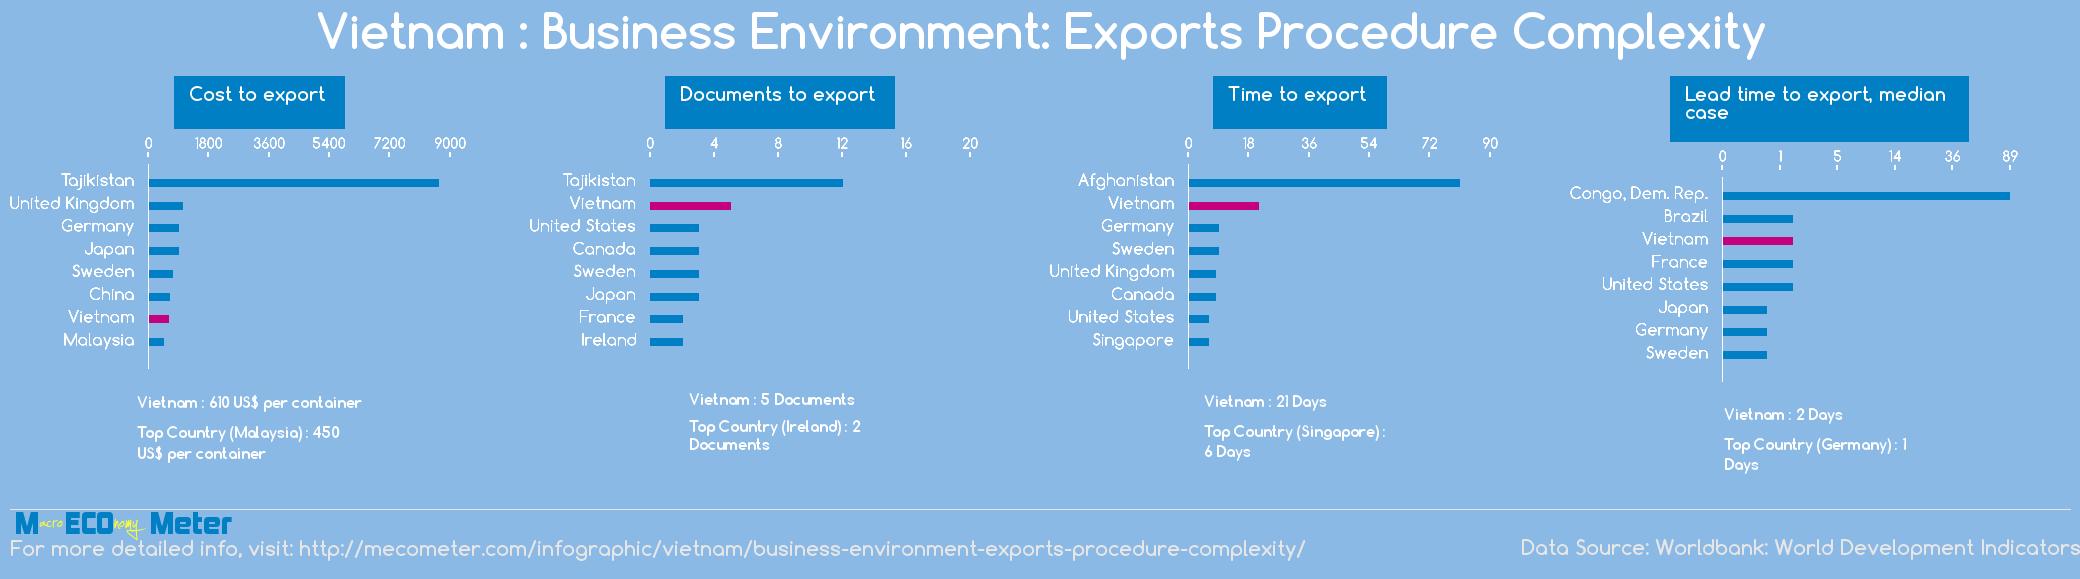 Vietnam : Business Environment: Exports Procedure Complexity